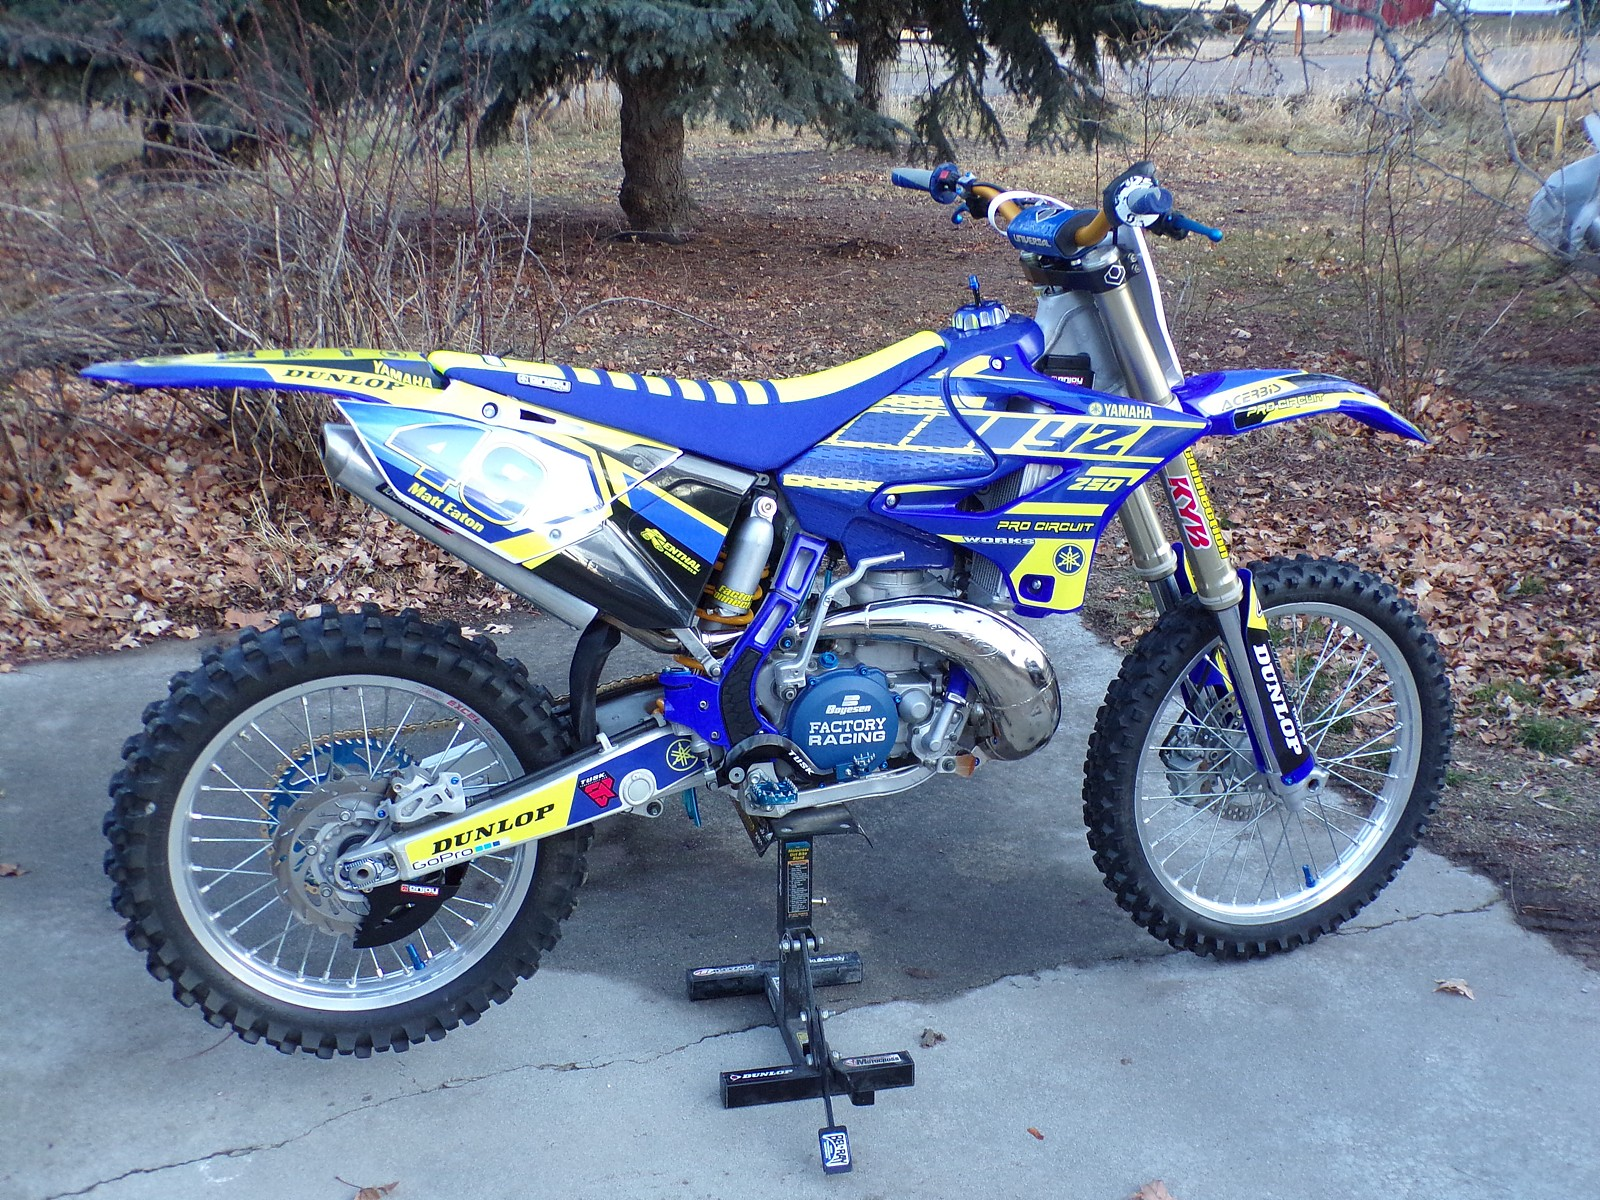 100 0363 - RMZFourfitty - Motocross Pictures - Vital MX